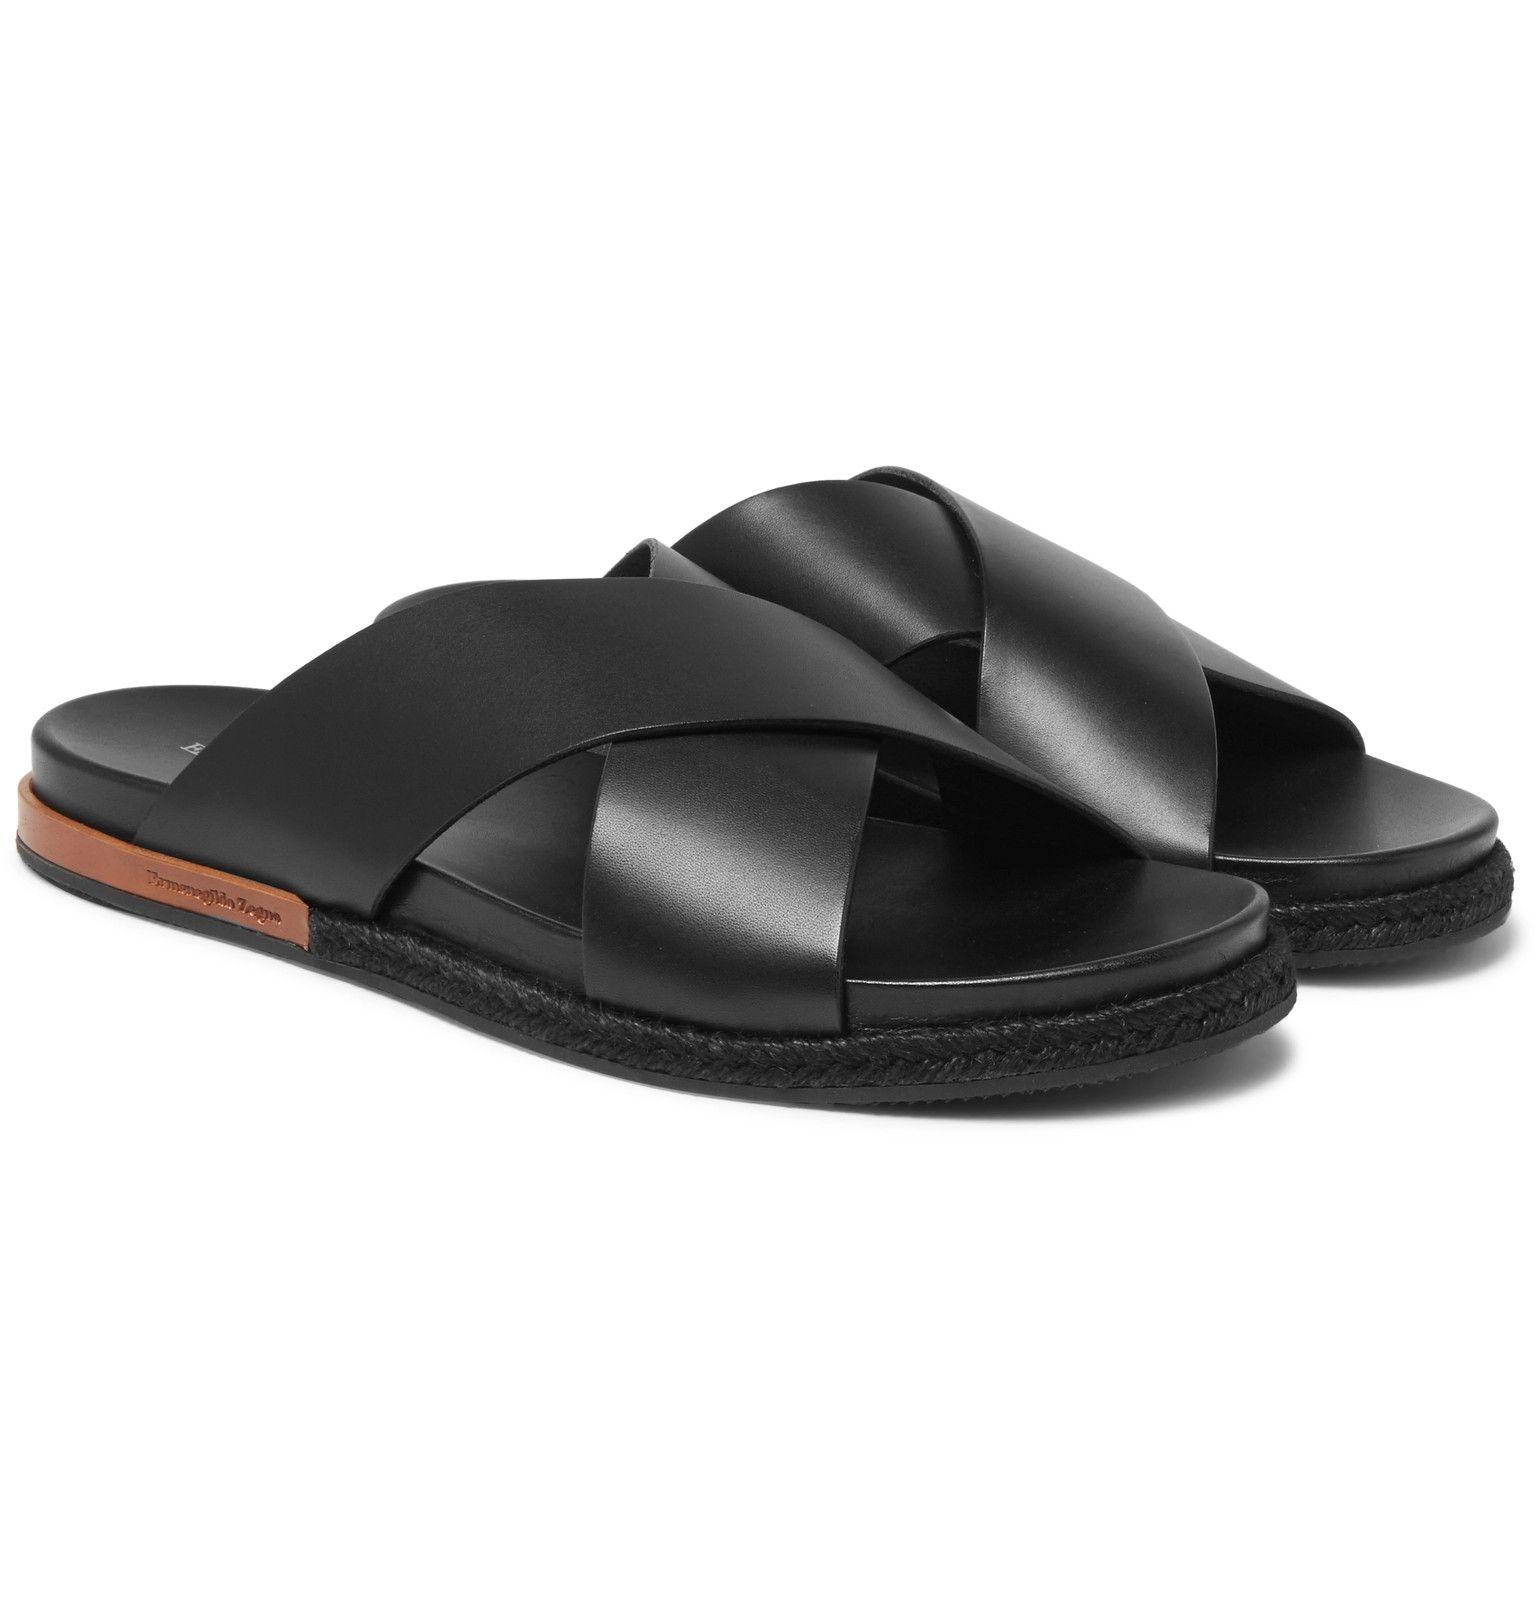 b12e46fa ERMENEGILDO ZEGNA Taormina Leather Sandals | men's sandals ...